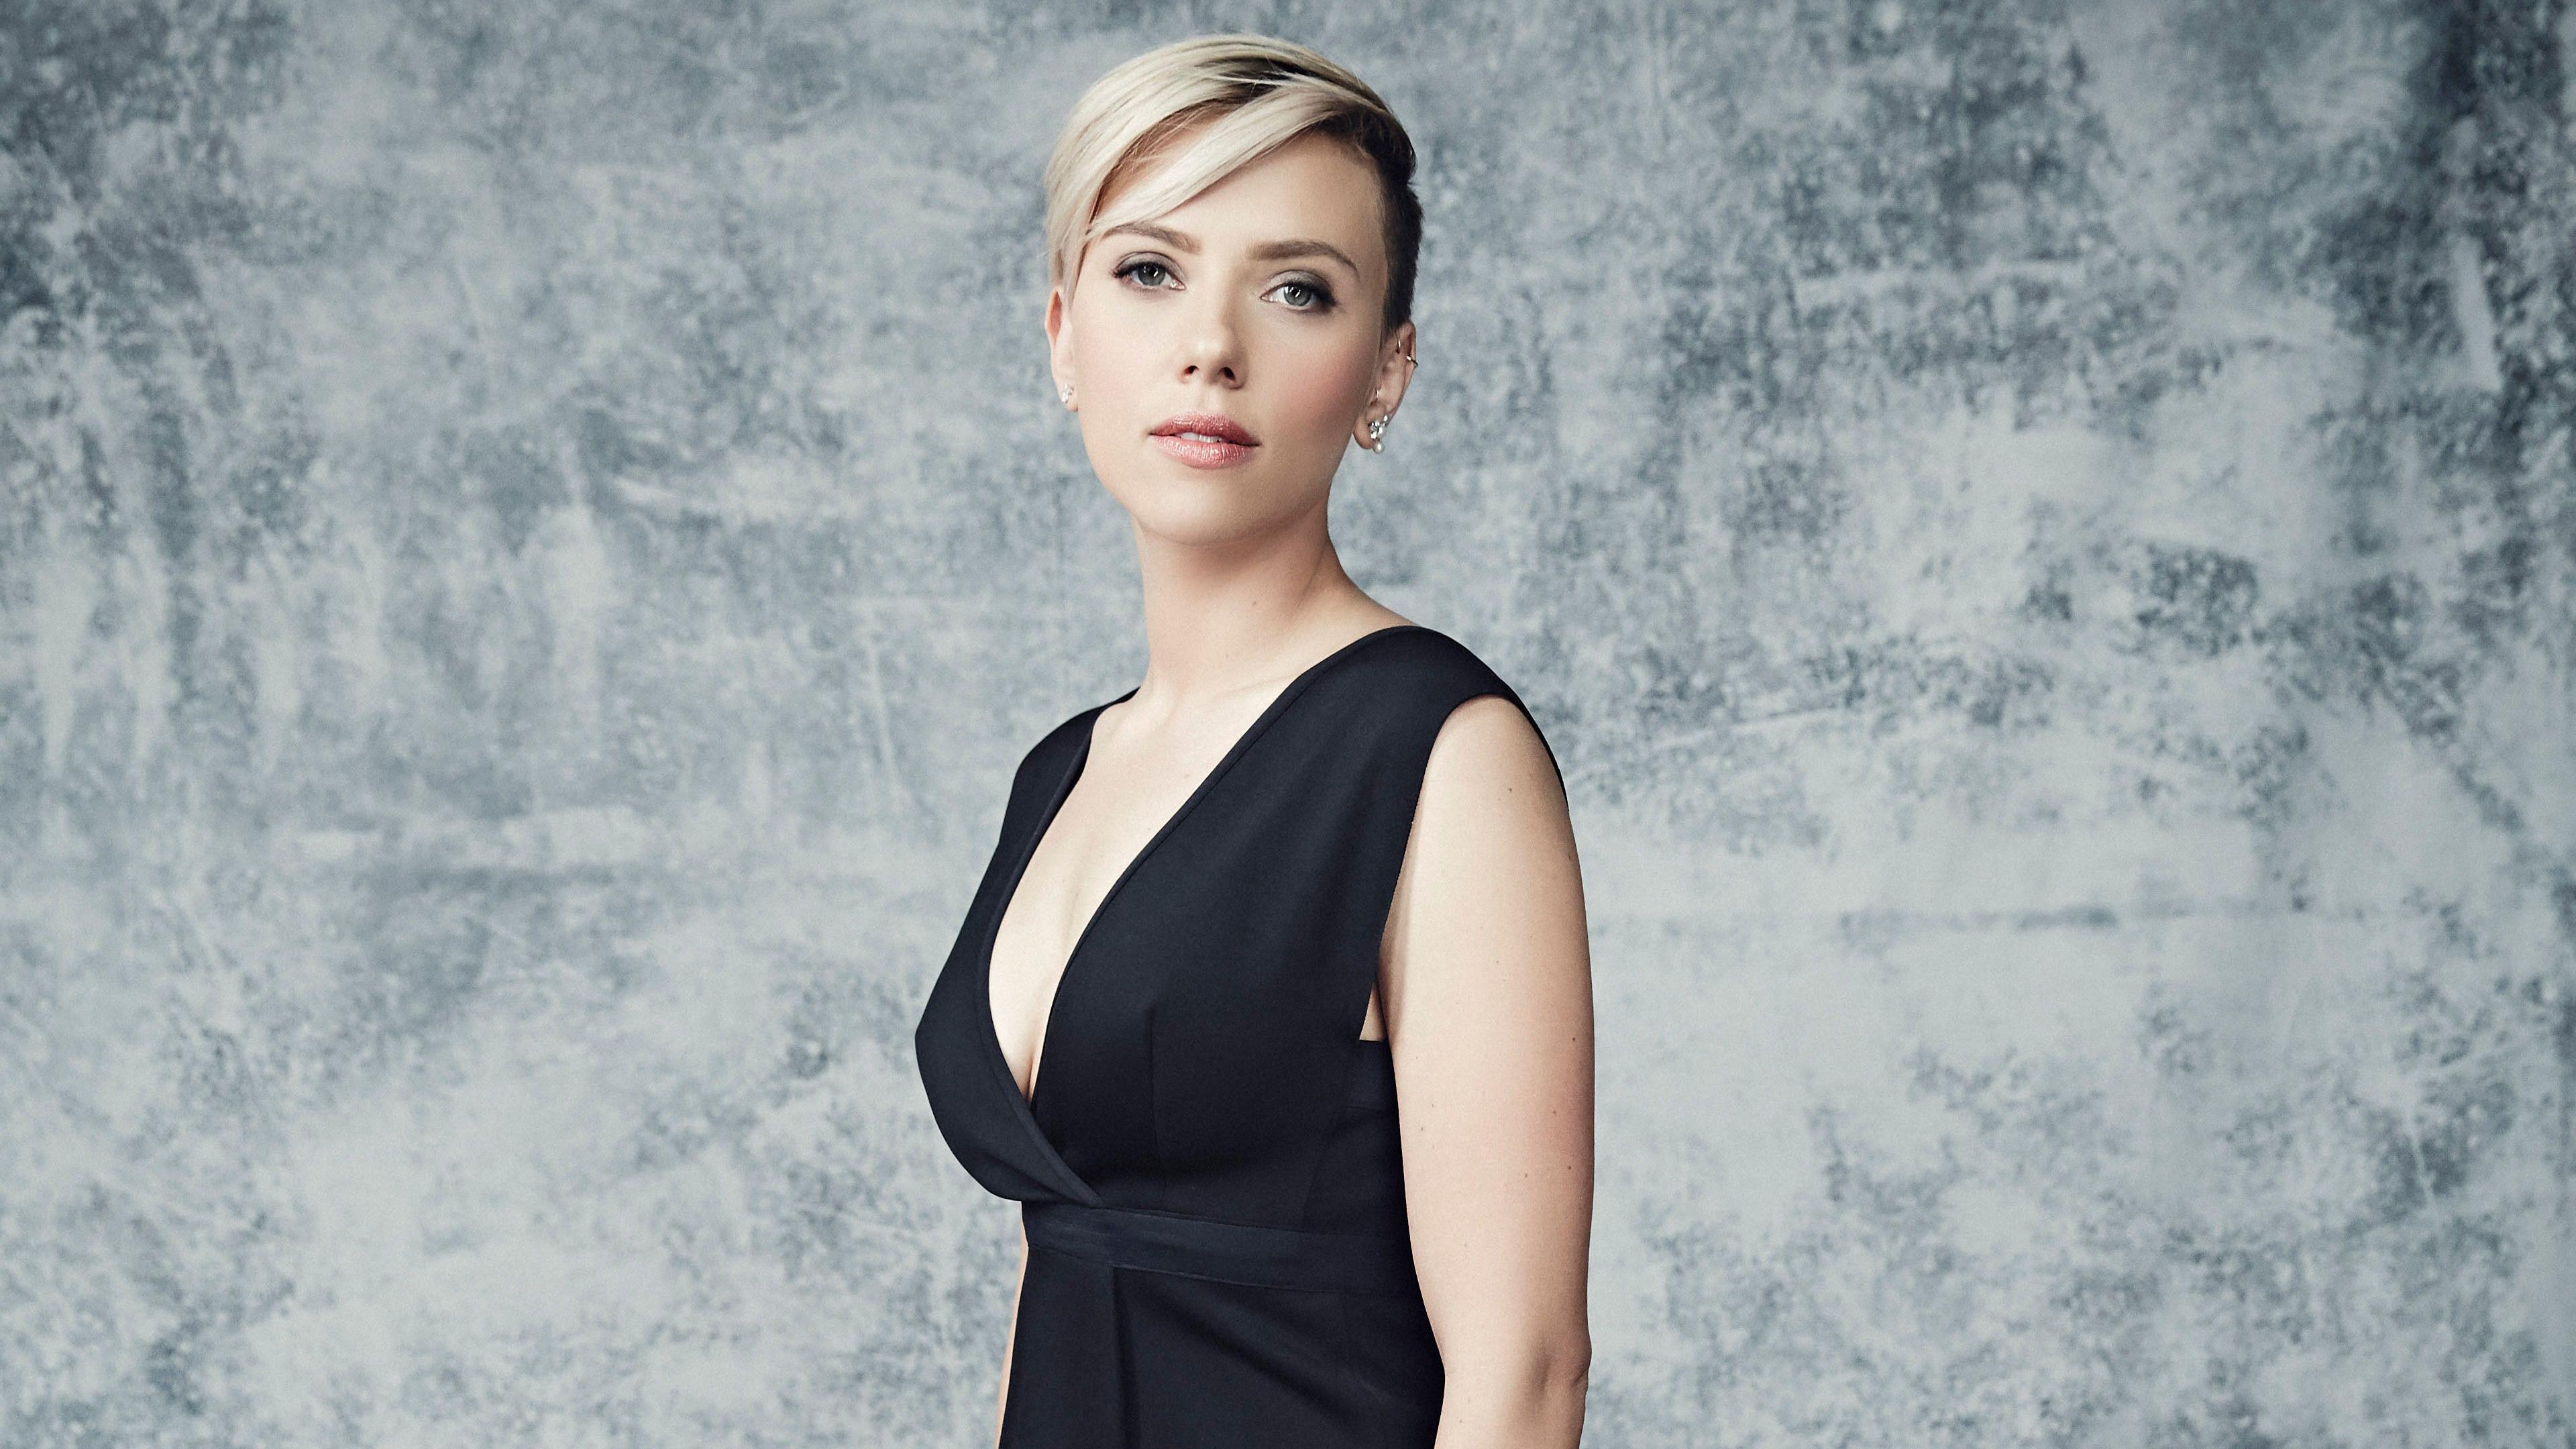 Scarlett Johansson 4k Ultra Fondo De Pantalla Hd Fondo De